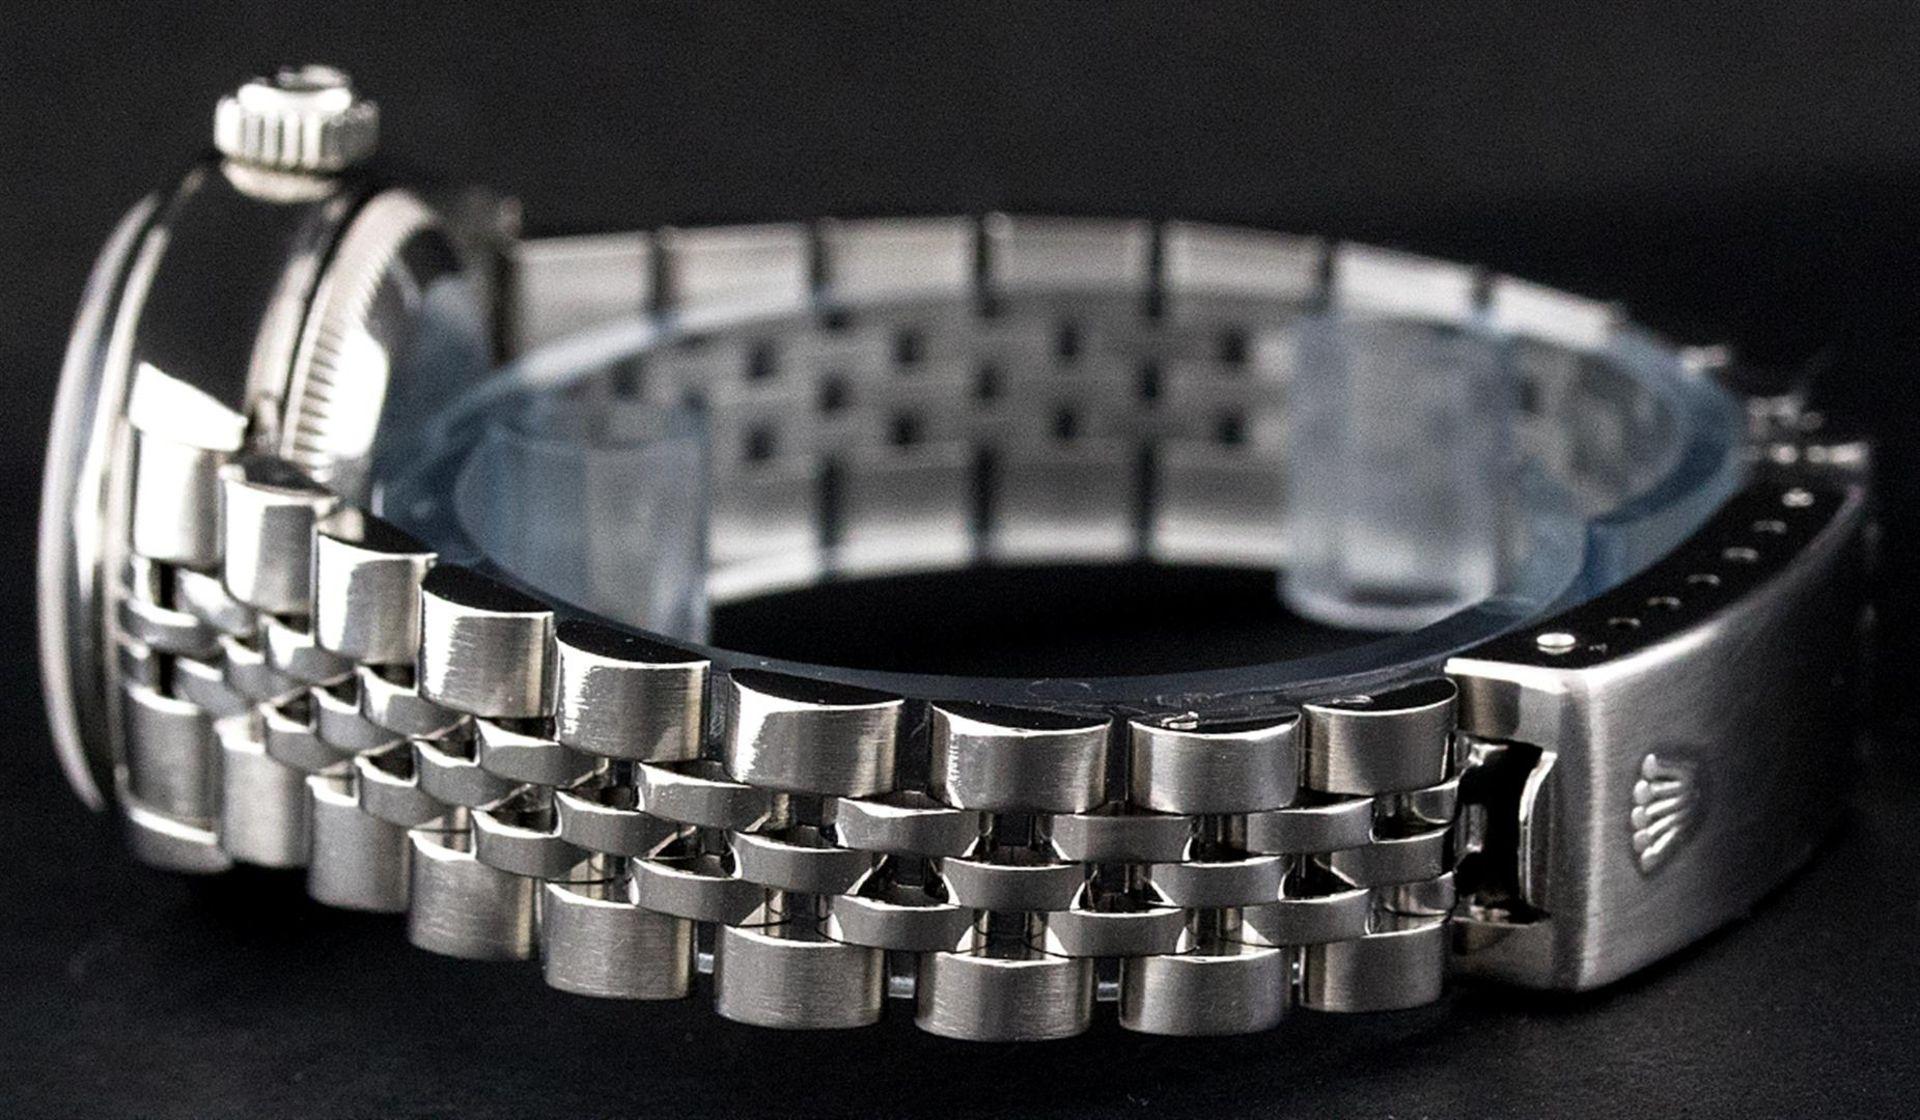 Rolex Ladies Stainless Steel Silver Index 26MM Quickset Datejust Wristwatch - Image 8 of 9